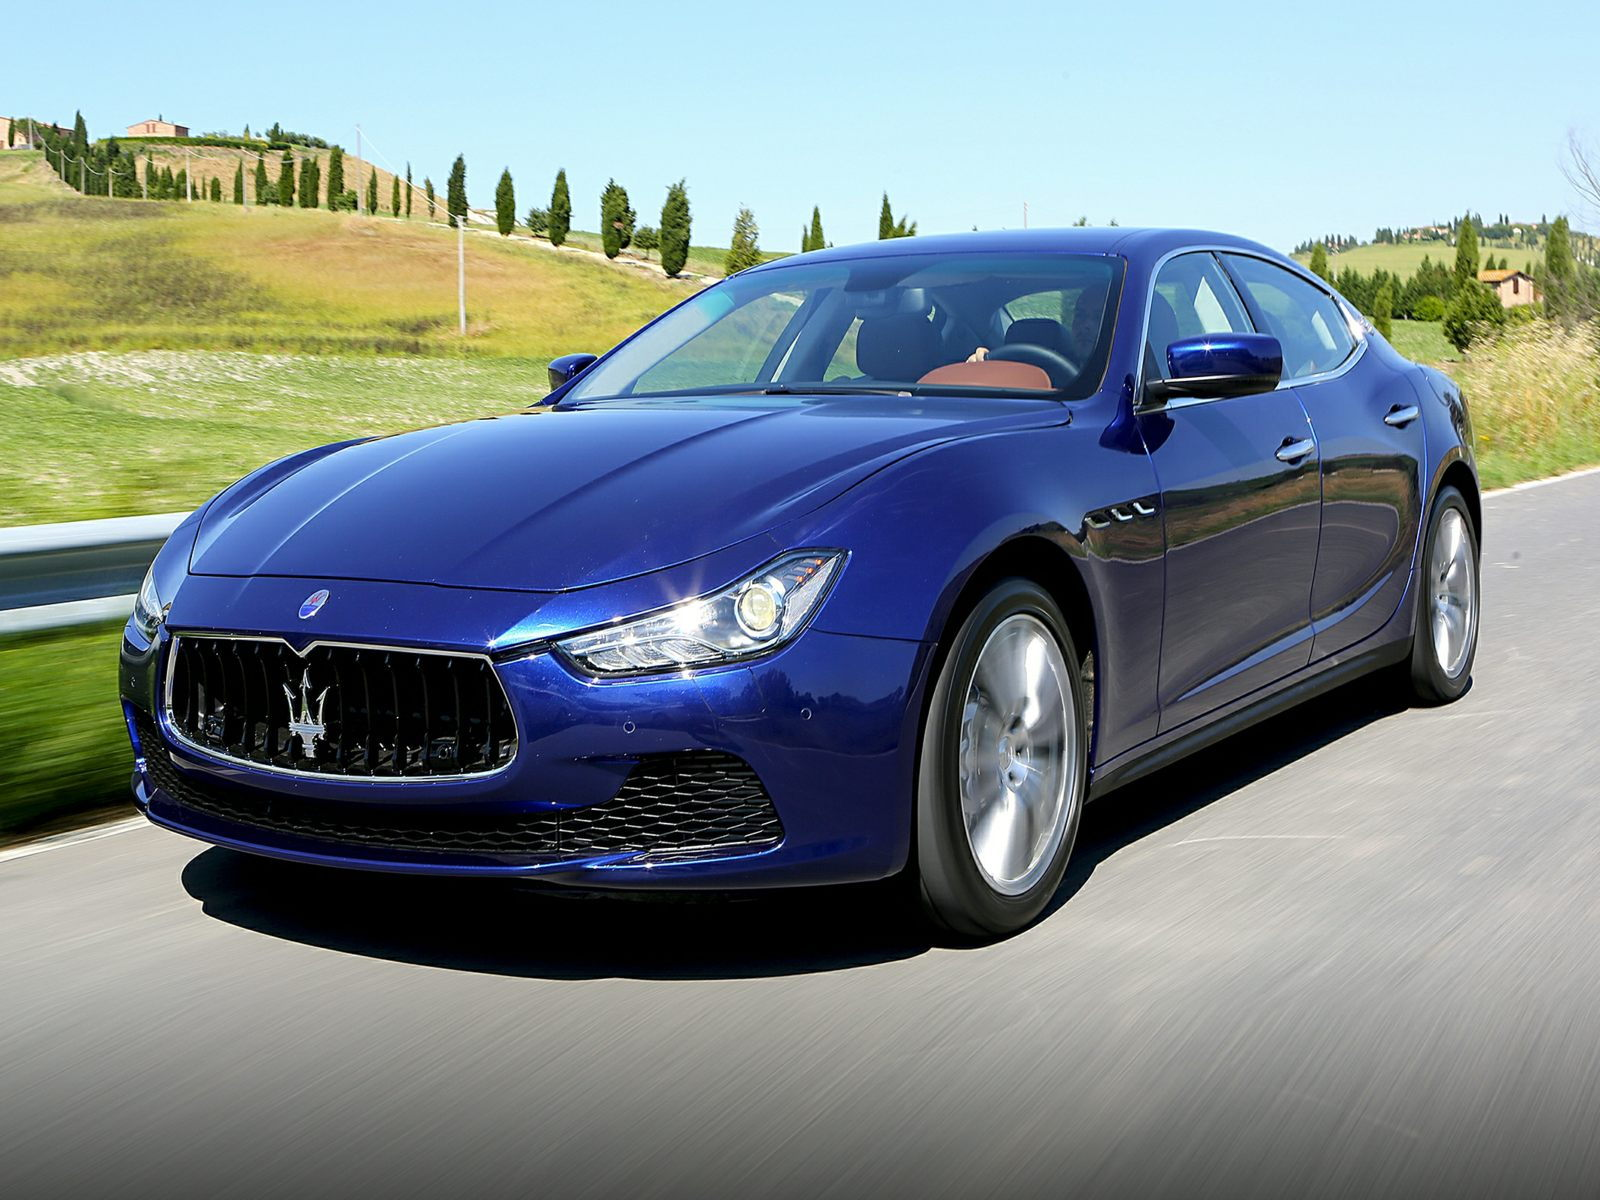 2014 Maserati Ghilbi Driving